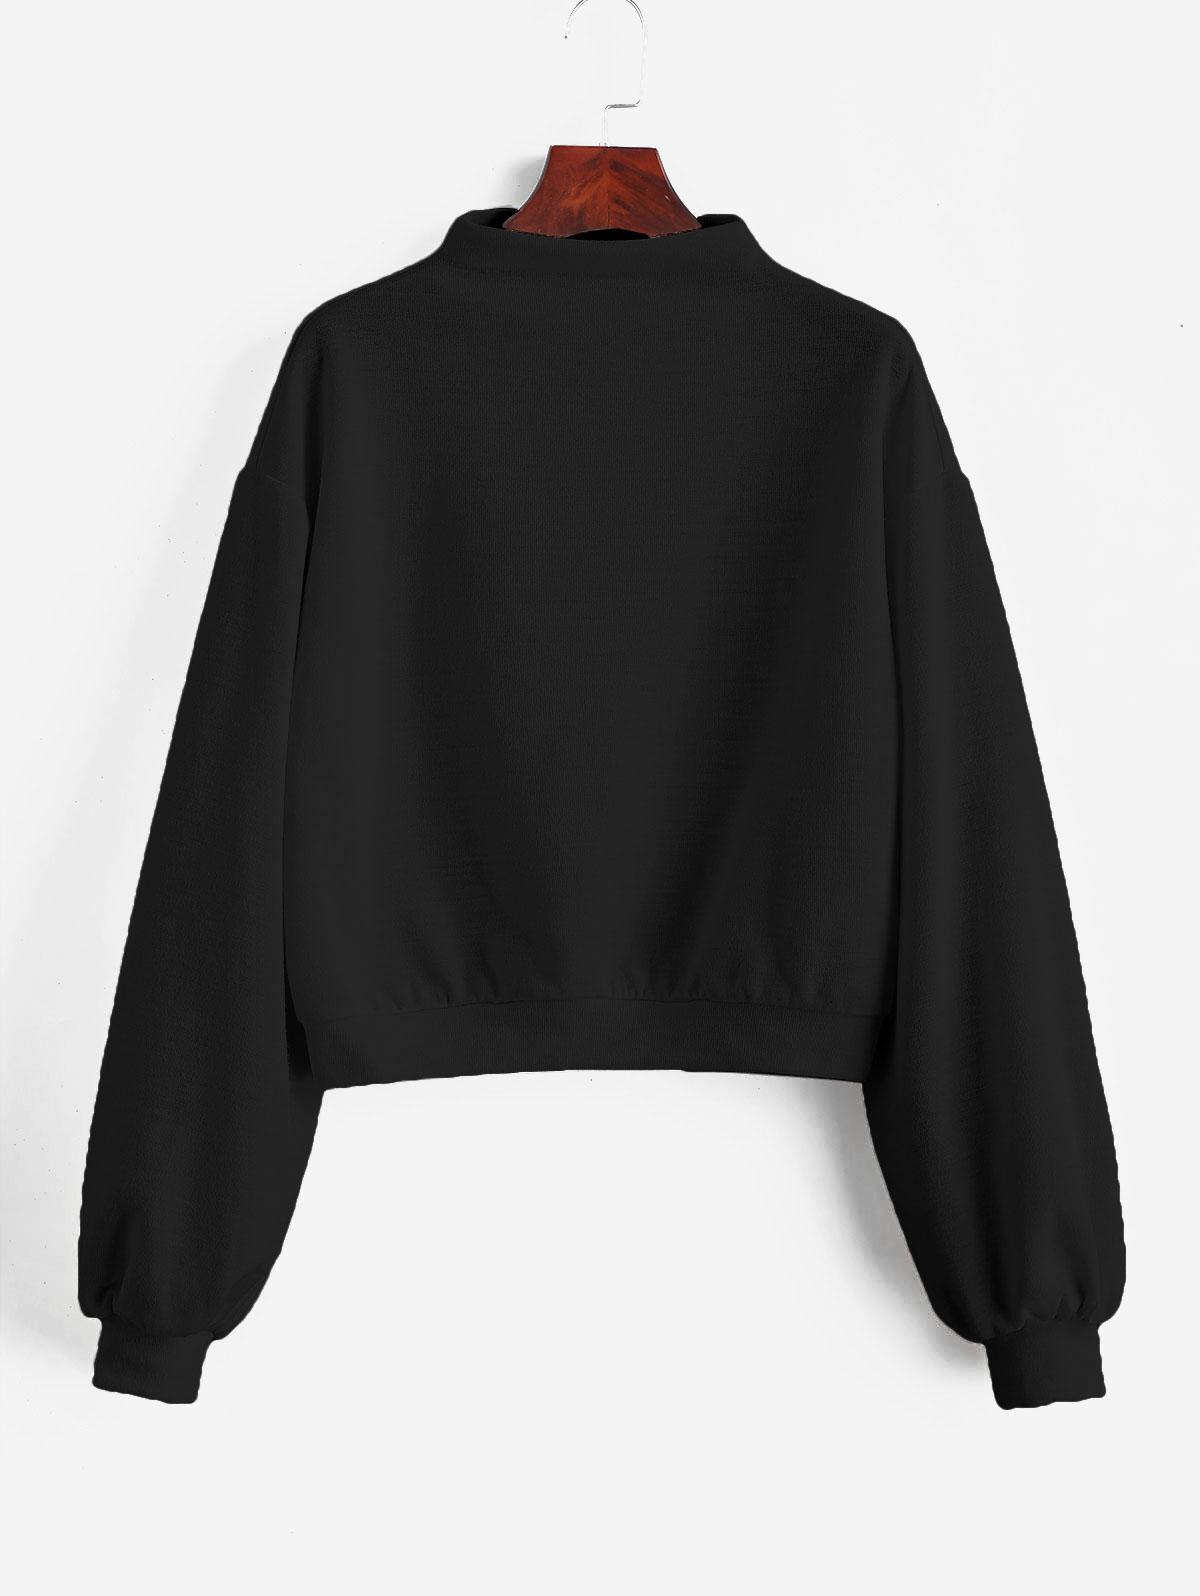 ZAFUL Pullover Mock Neck Plain Sweatshirt фото